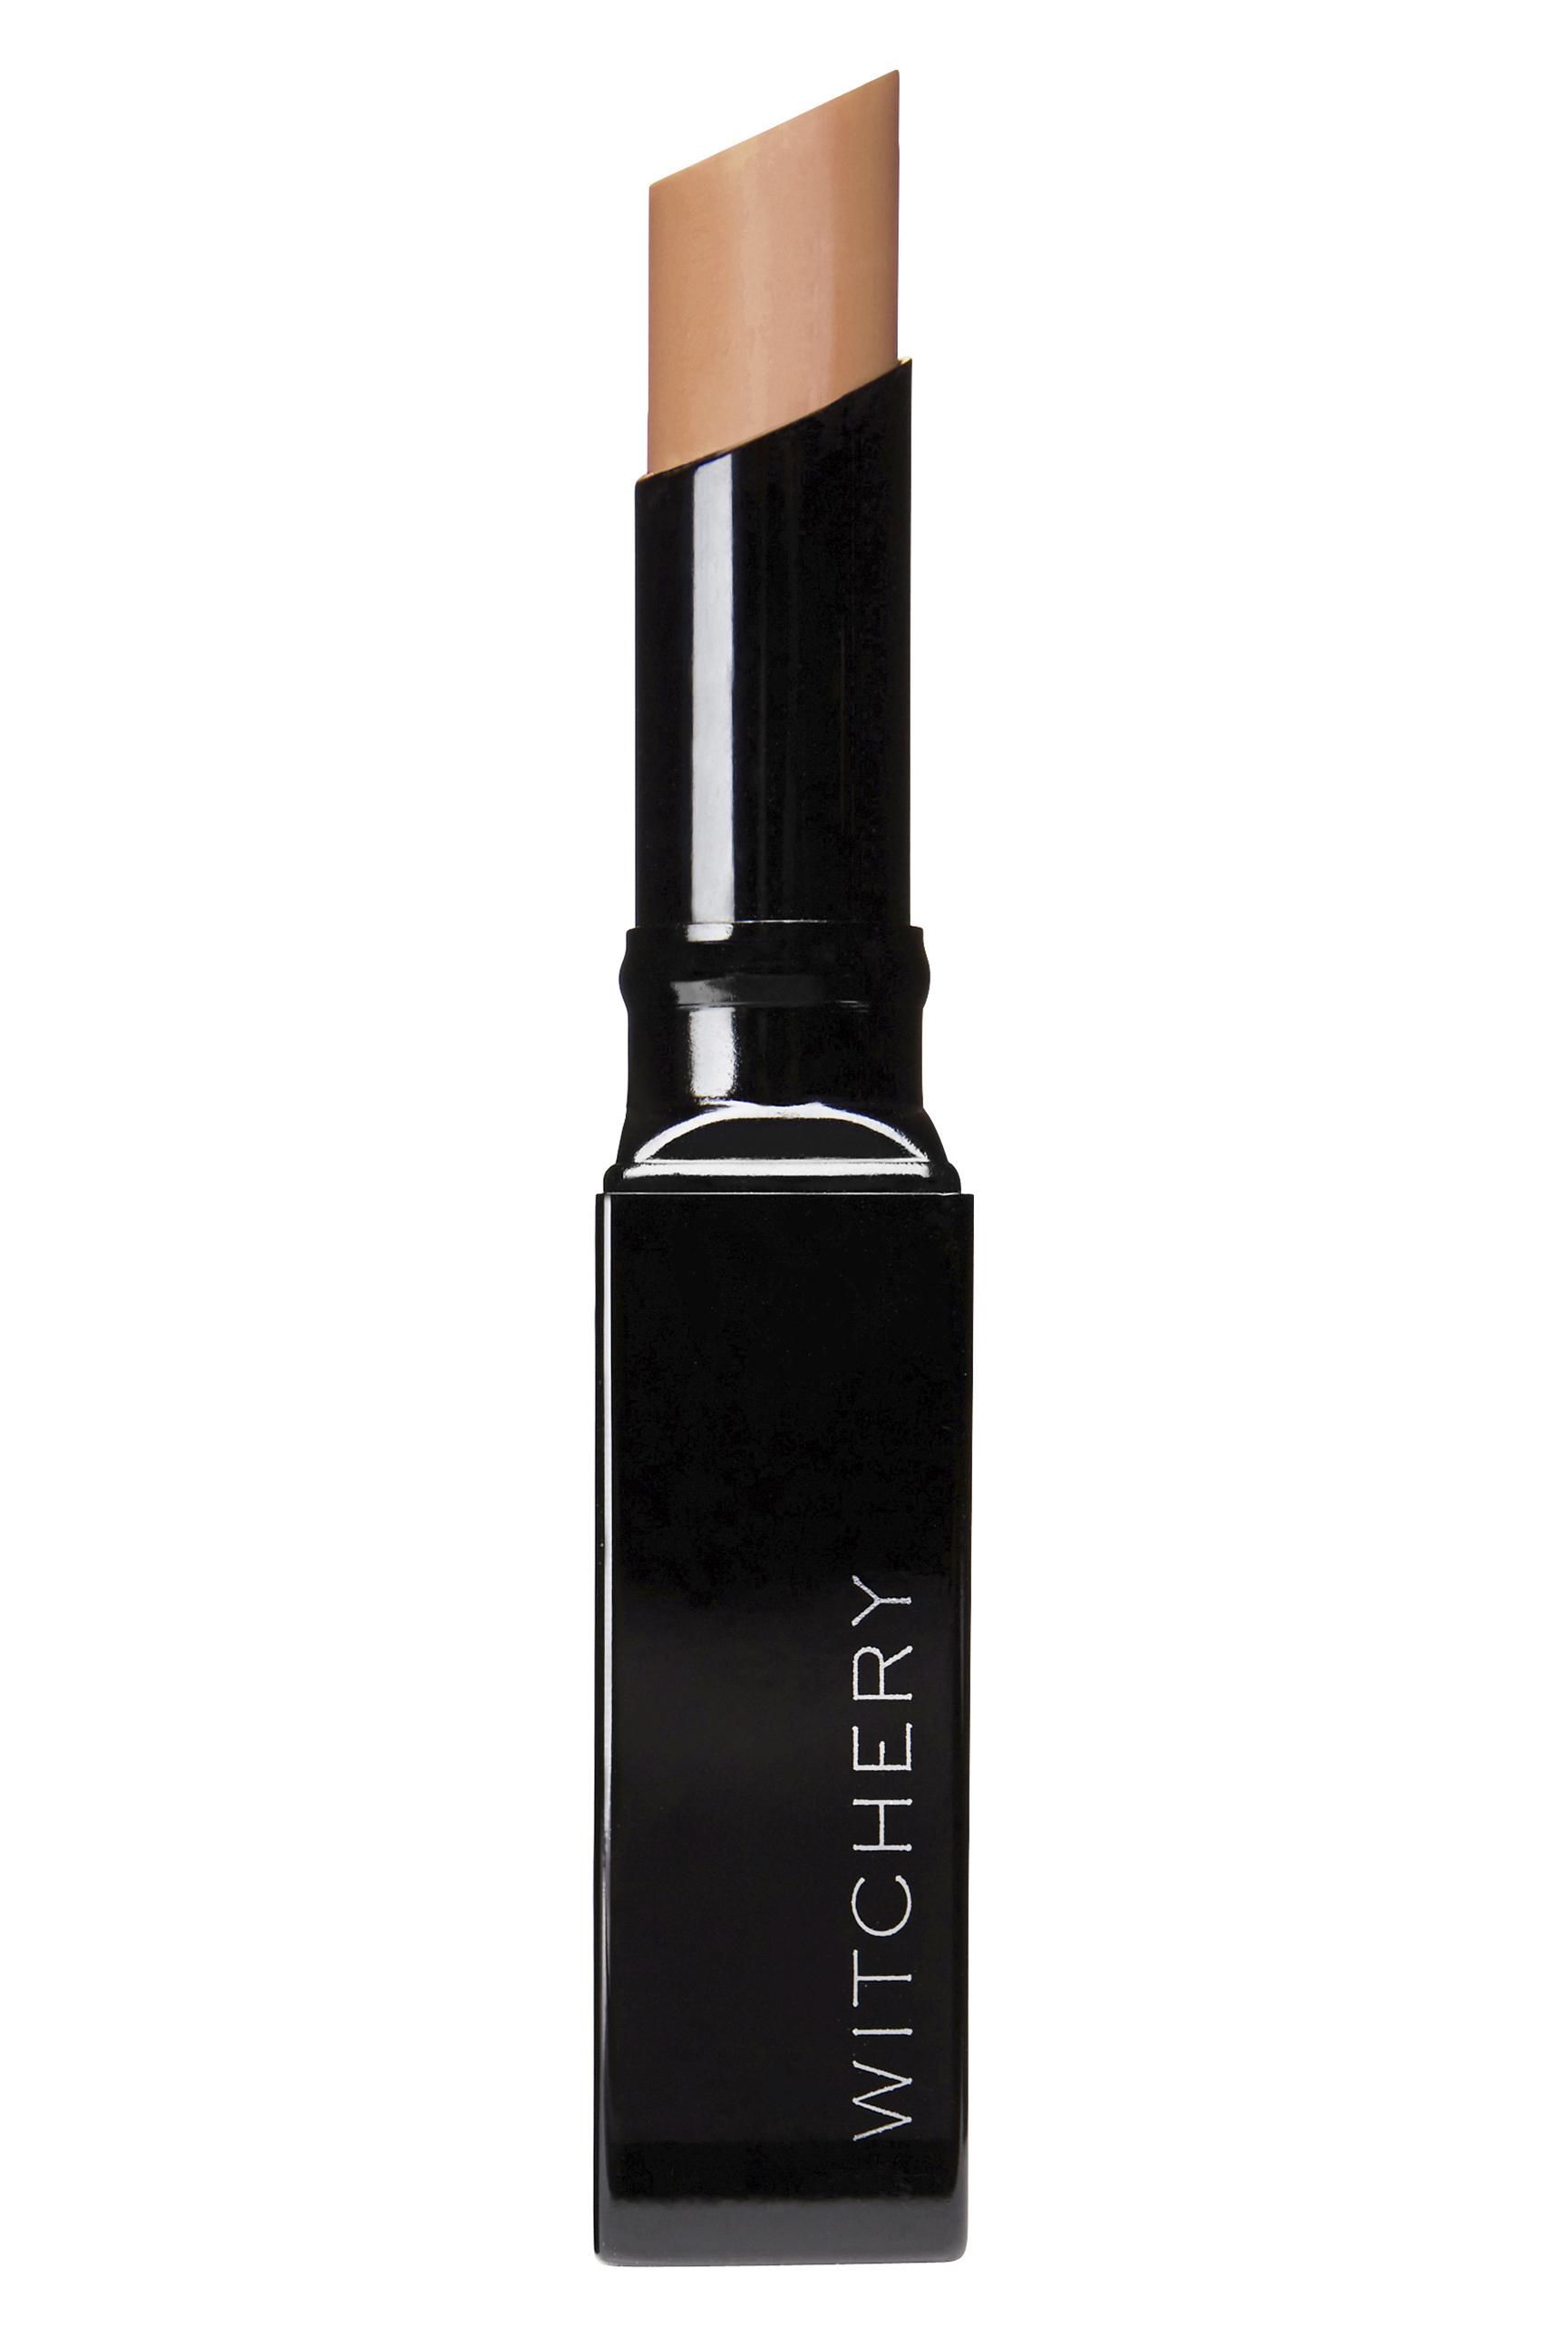 60172148_wticherybeauty-lipstick-18-90-biscuit